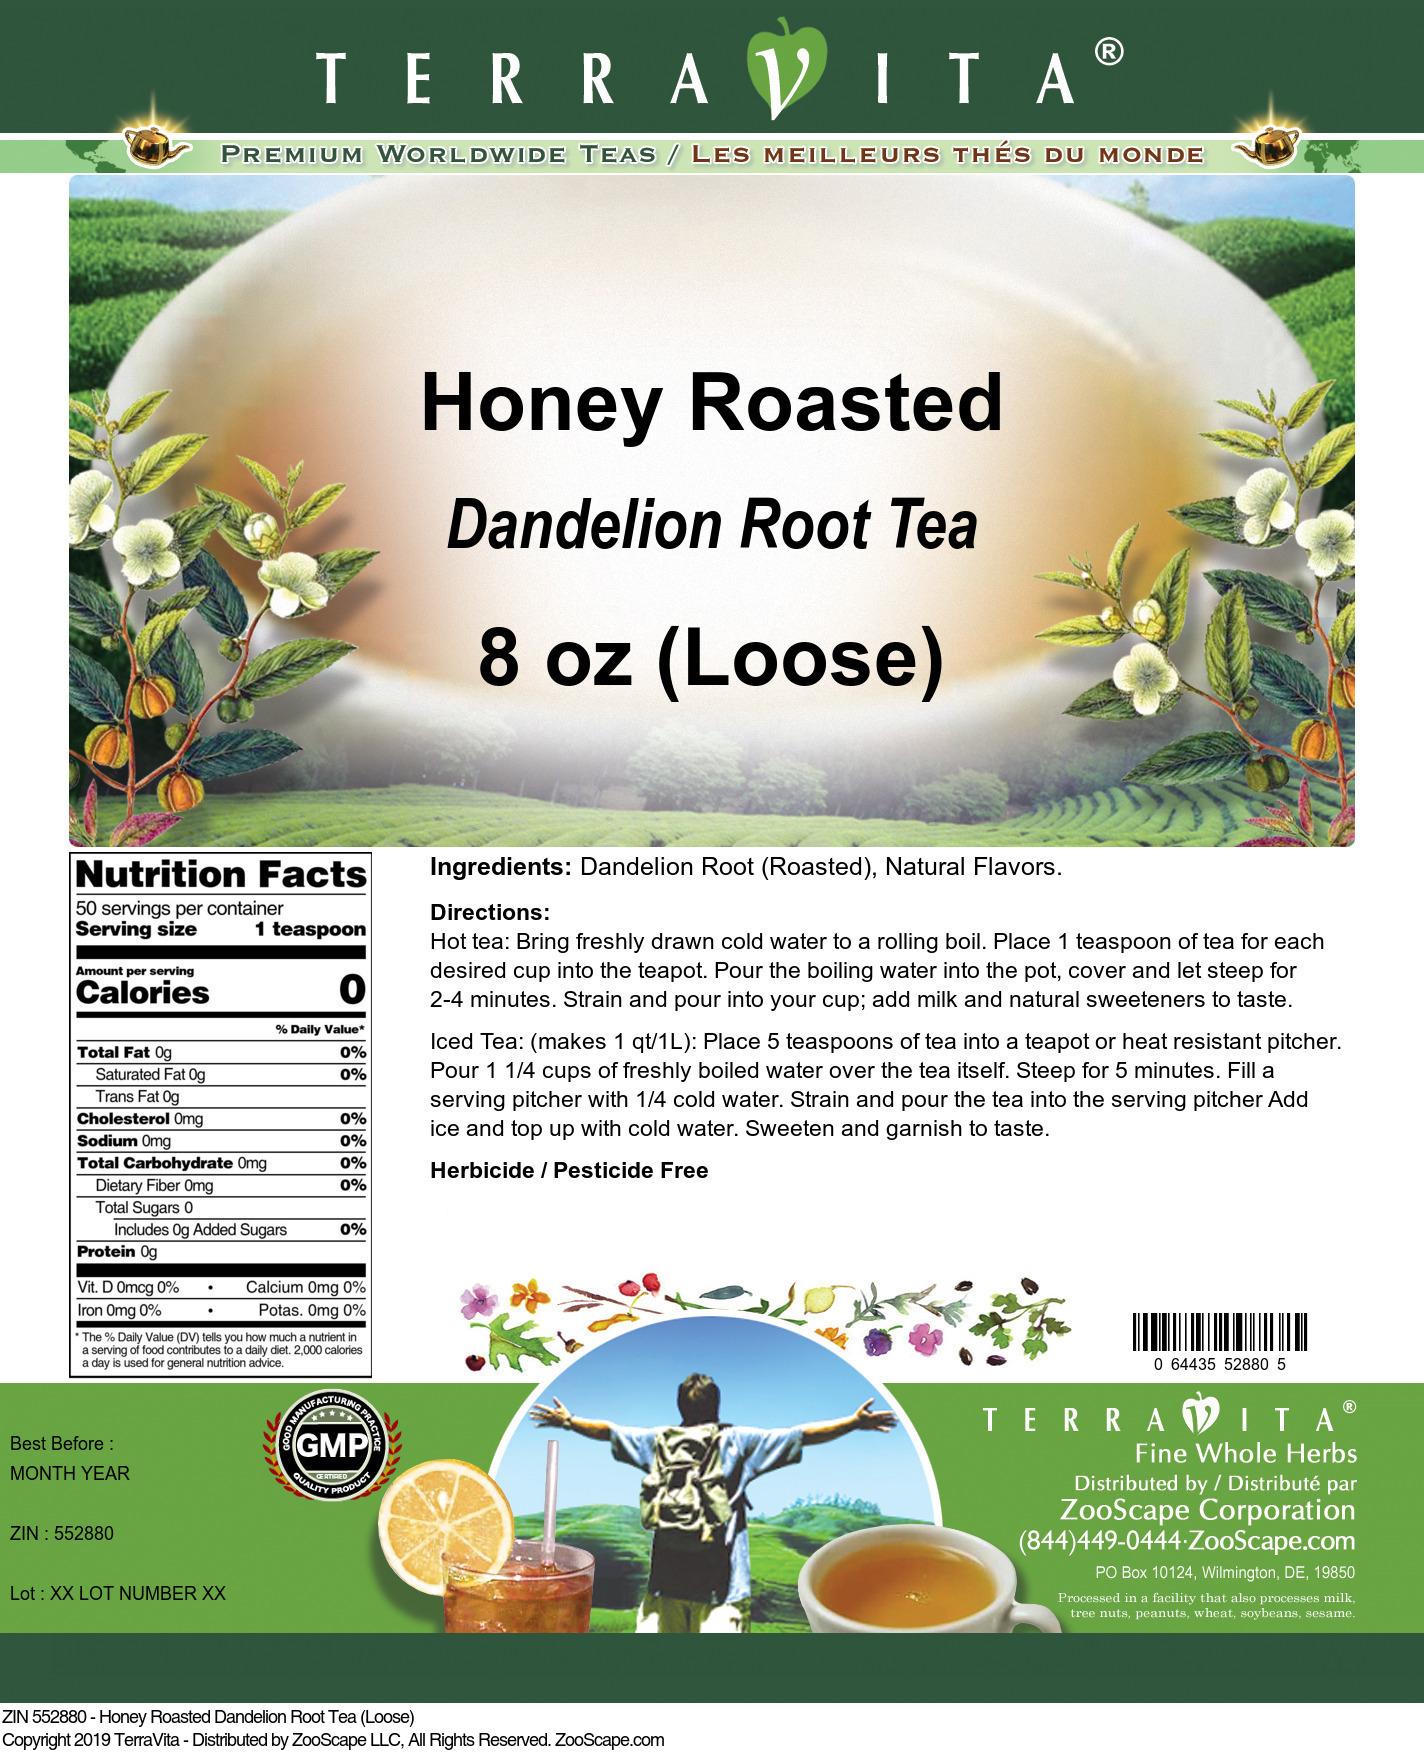 Honey Roasted Dandelion Root